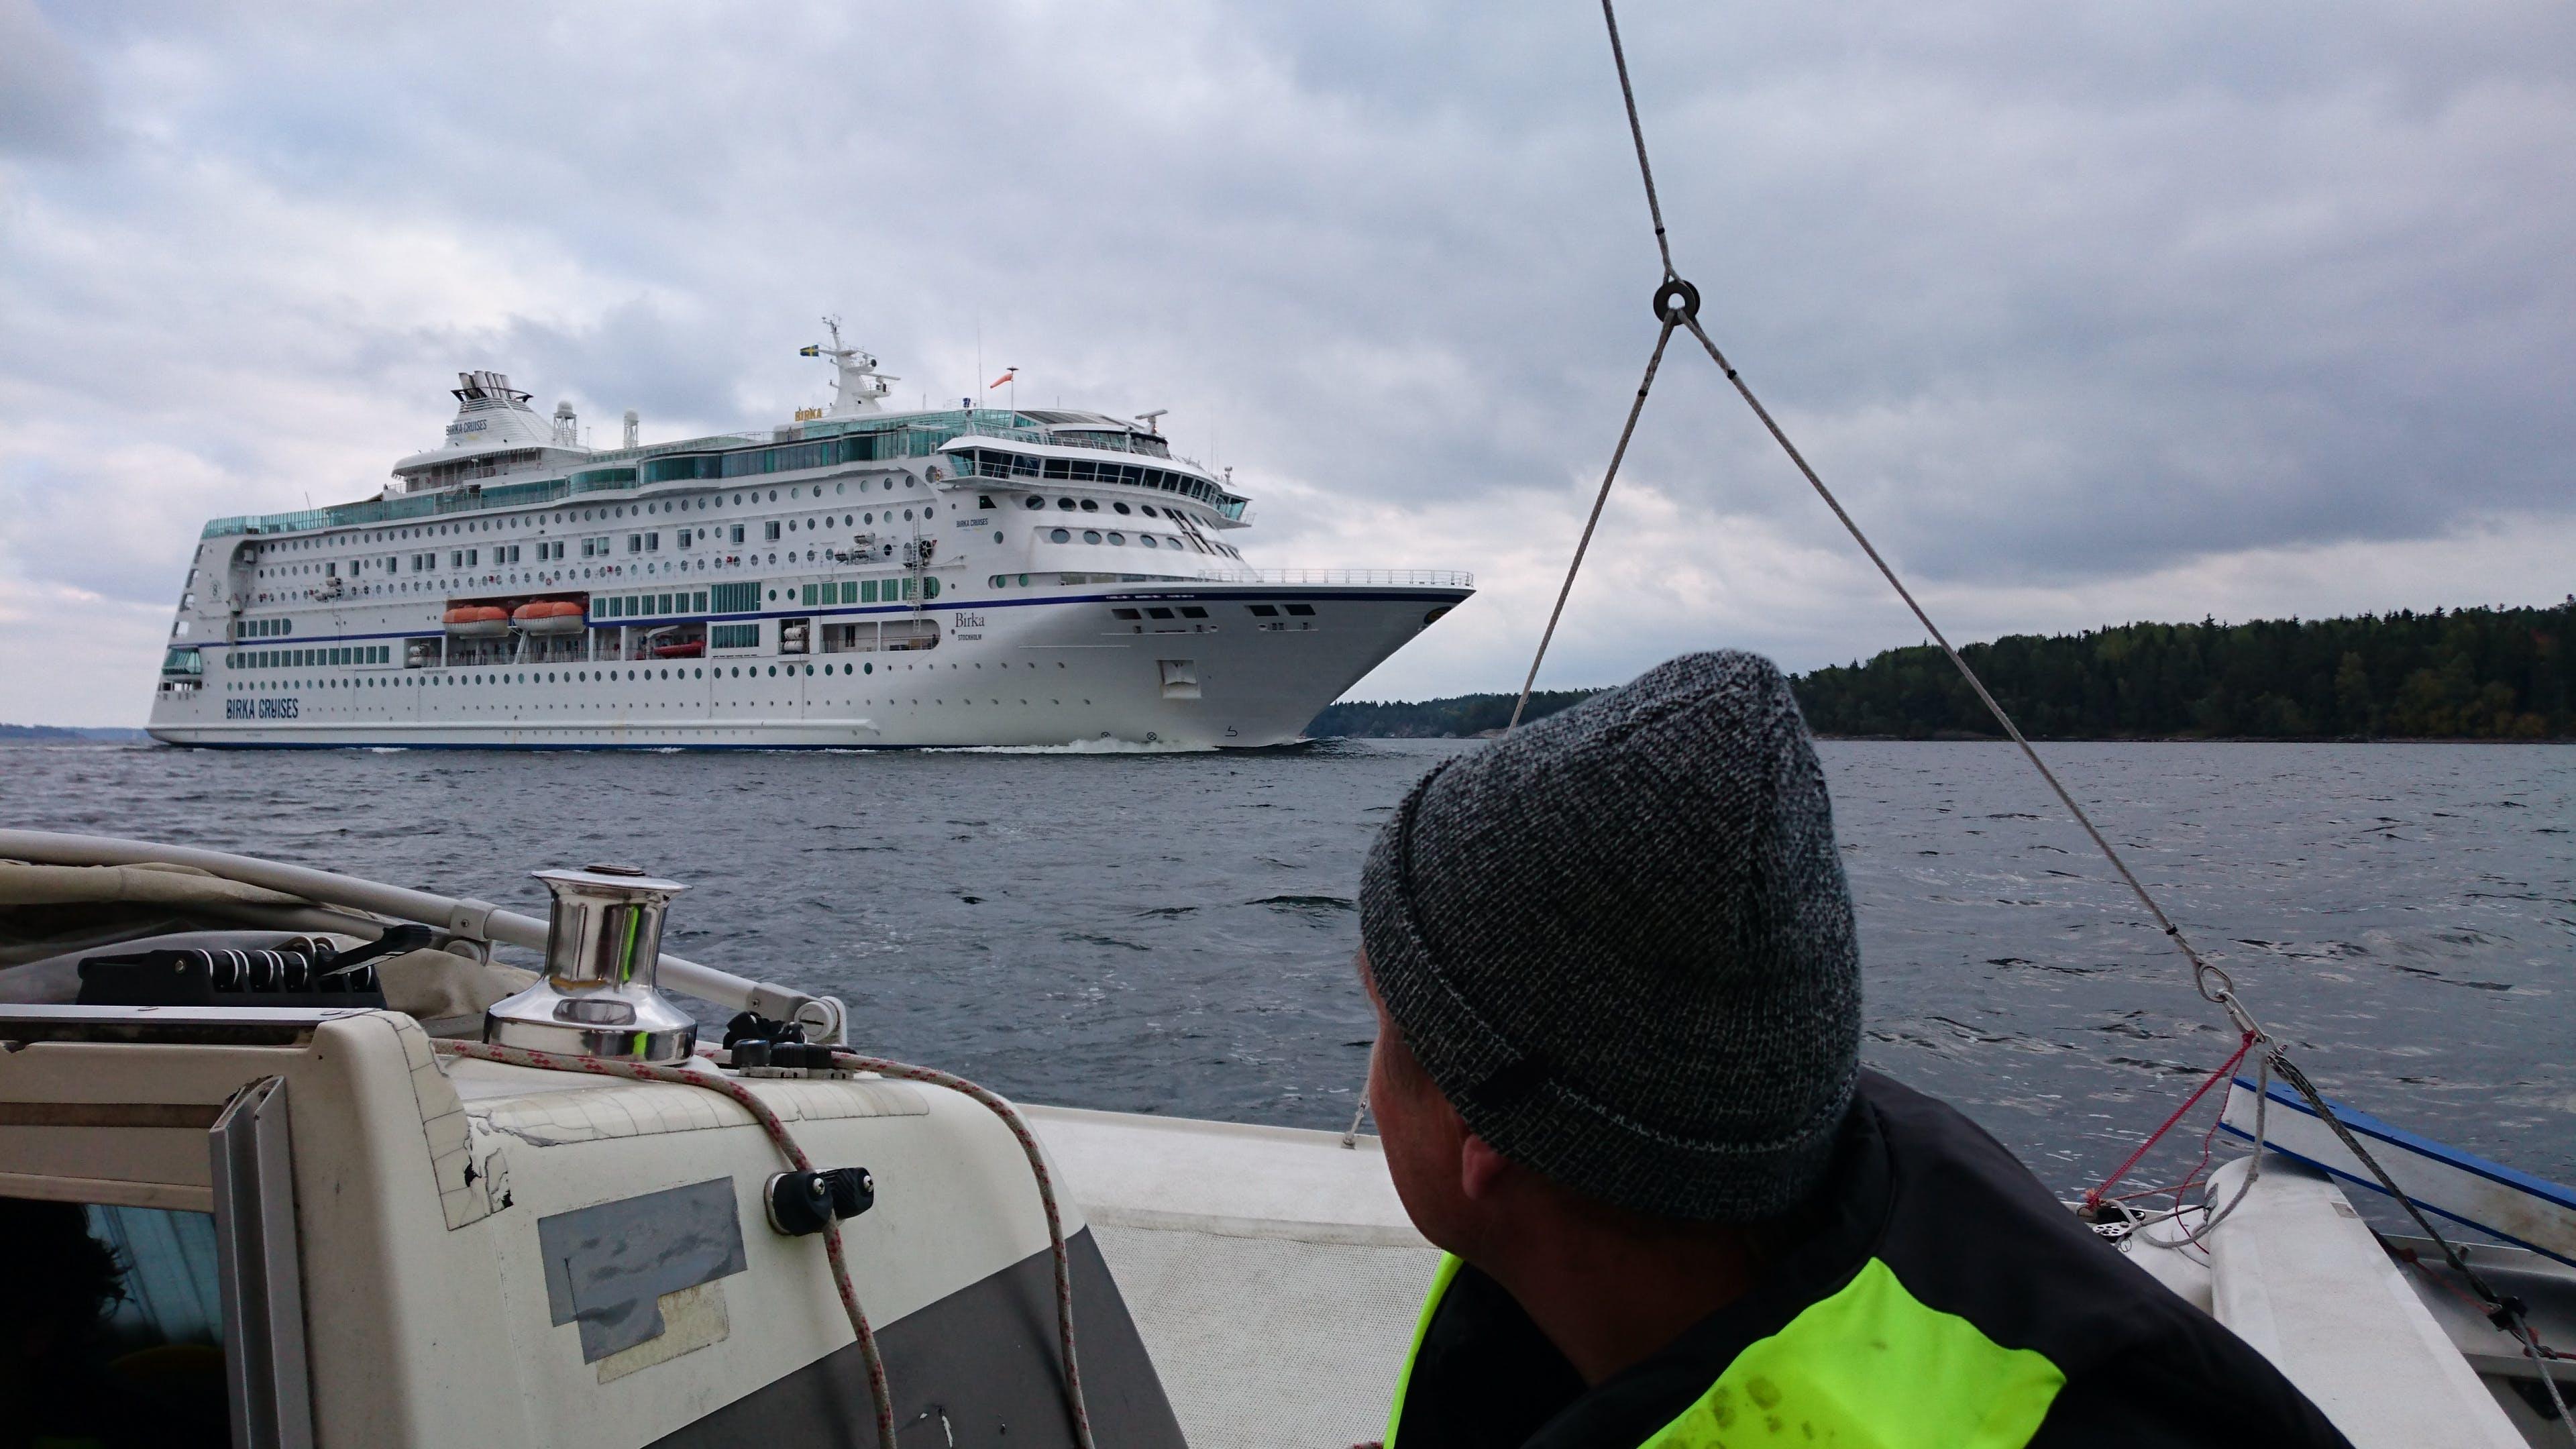 Free stock photo of cruise ship, sailboat